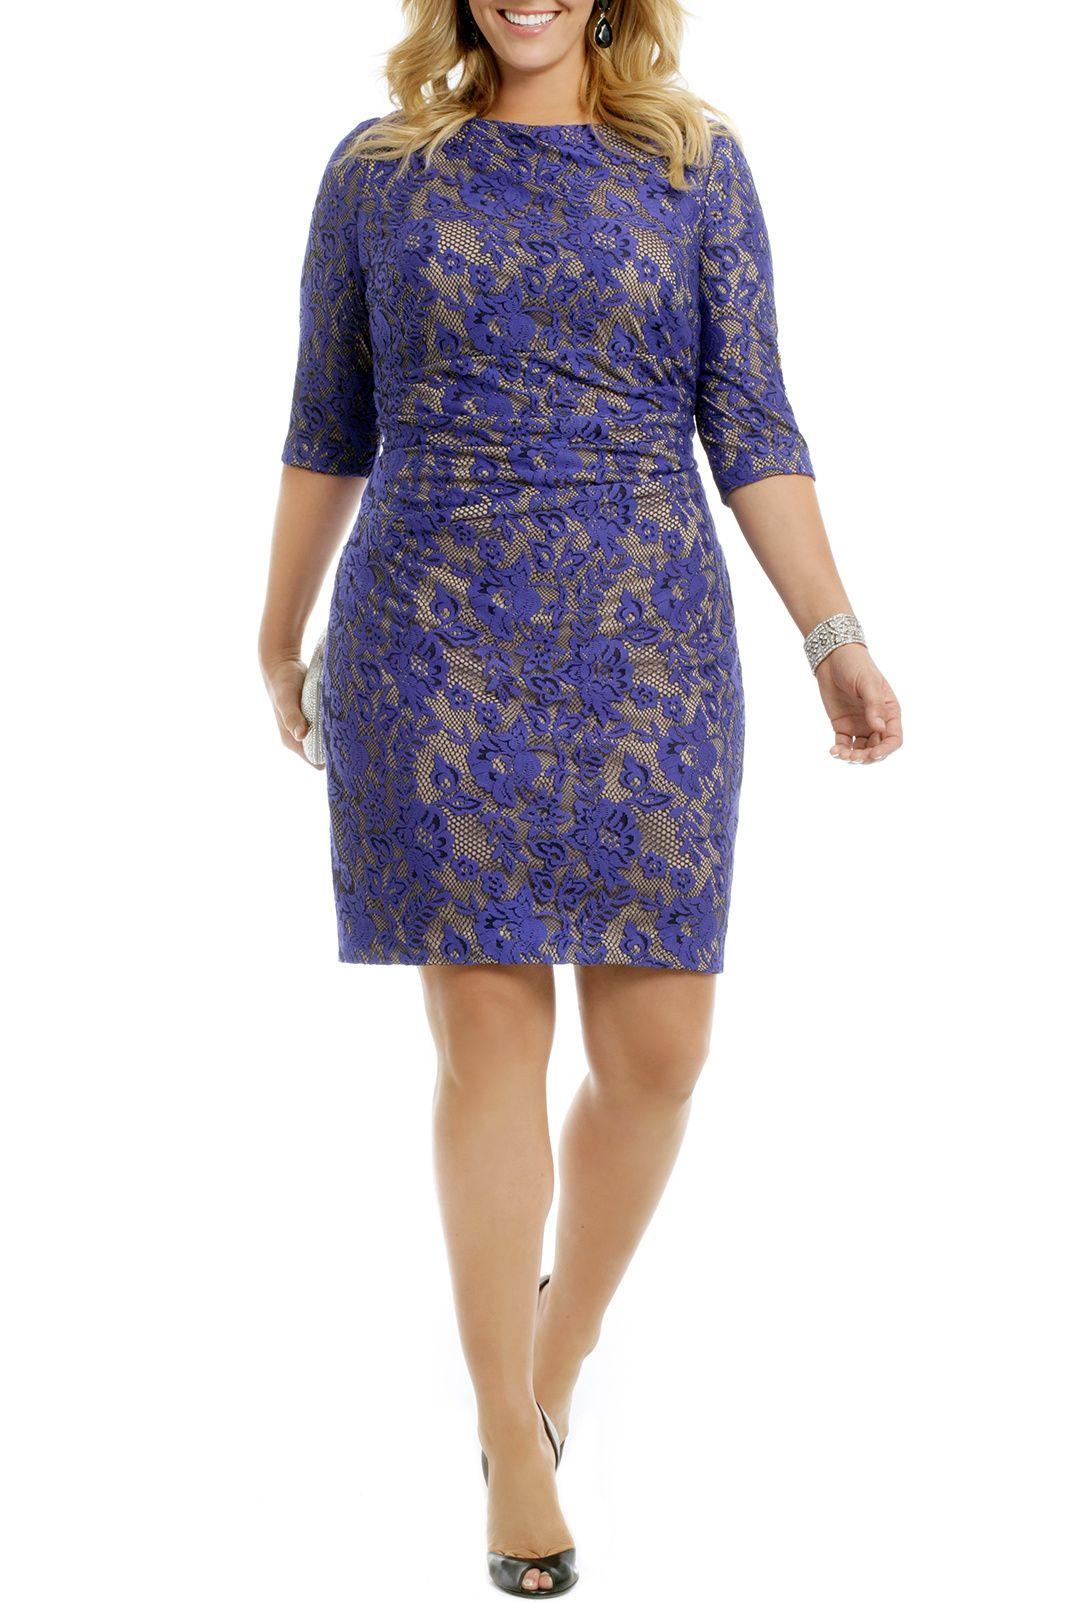 Plus size wedding dress rental  Blue Beauty Dress  Wedding Guest Mood Board  Pinterest  Kay unger